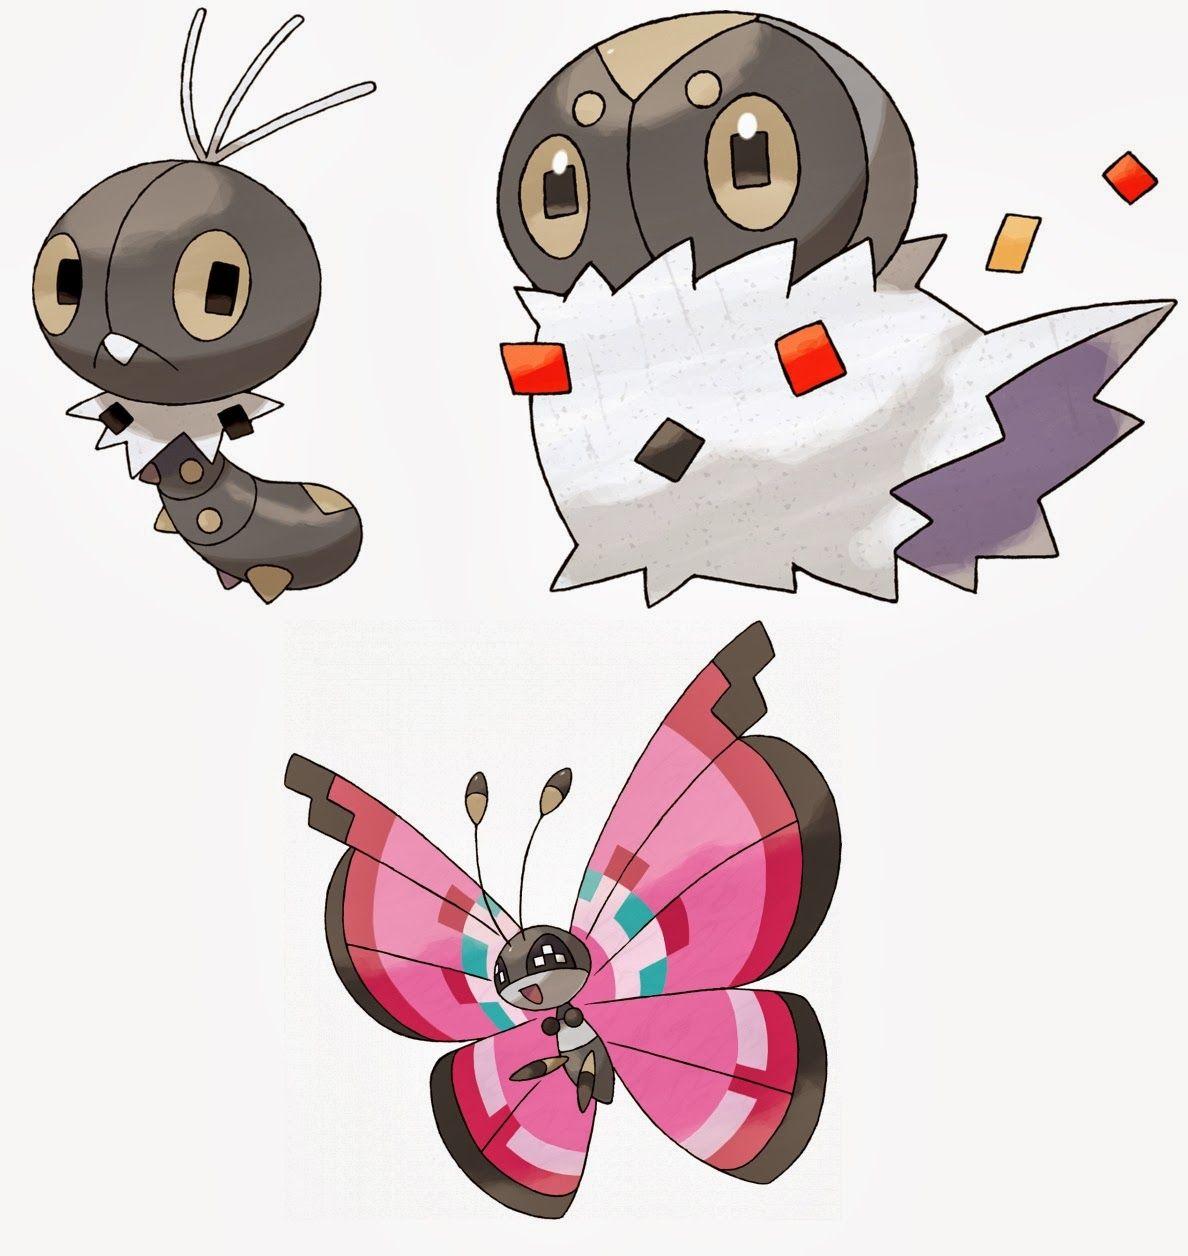 Scatterbug Spewpa Vivillon 664 666 Evolutions Pokemon Pokemon X Cards Pokémon go spewpa is a bug type pokemon with a max cp of 542 , 48 attack, 89 defense and 128 stamina in pokemon go. scatterbug spewpa vivillon 664